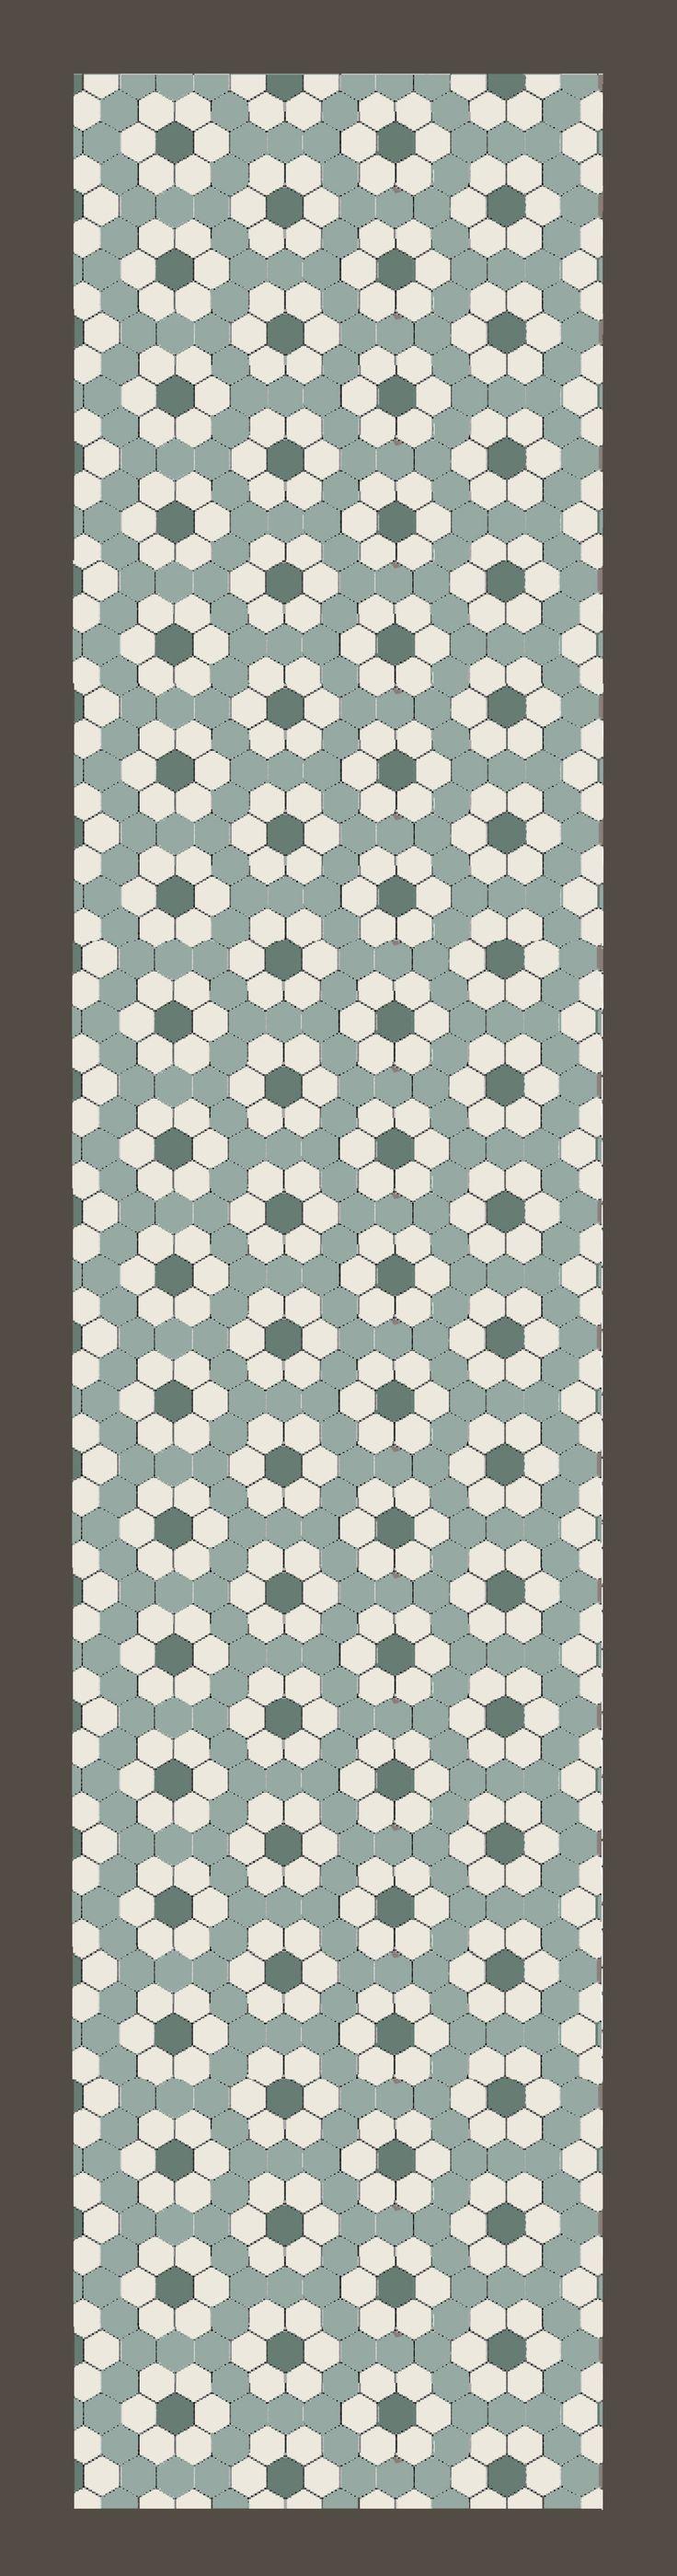 in de gang hexagon 10x10 cm blue pale, blanc vert pale antraciet. vanaf 89 euro per m2. Hexagon tile pattern | via mozaiek.com utrecht  http://mozaiek.com/hexagontegels-gang-matte-poederkleuren-mozaiek-com-hexagonlove/